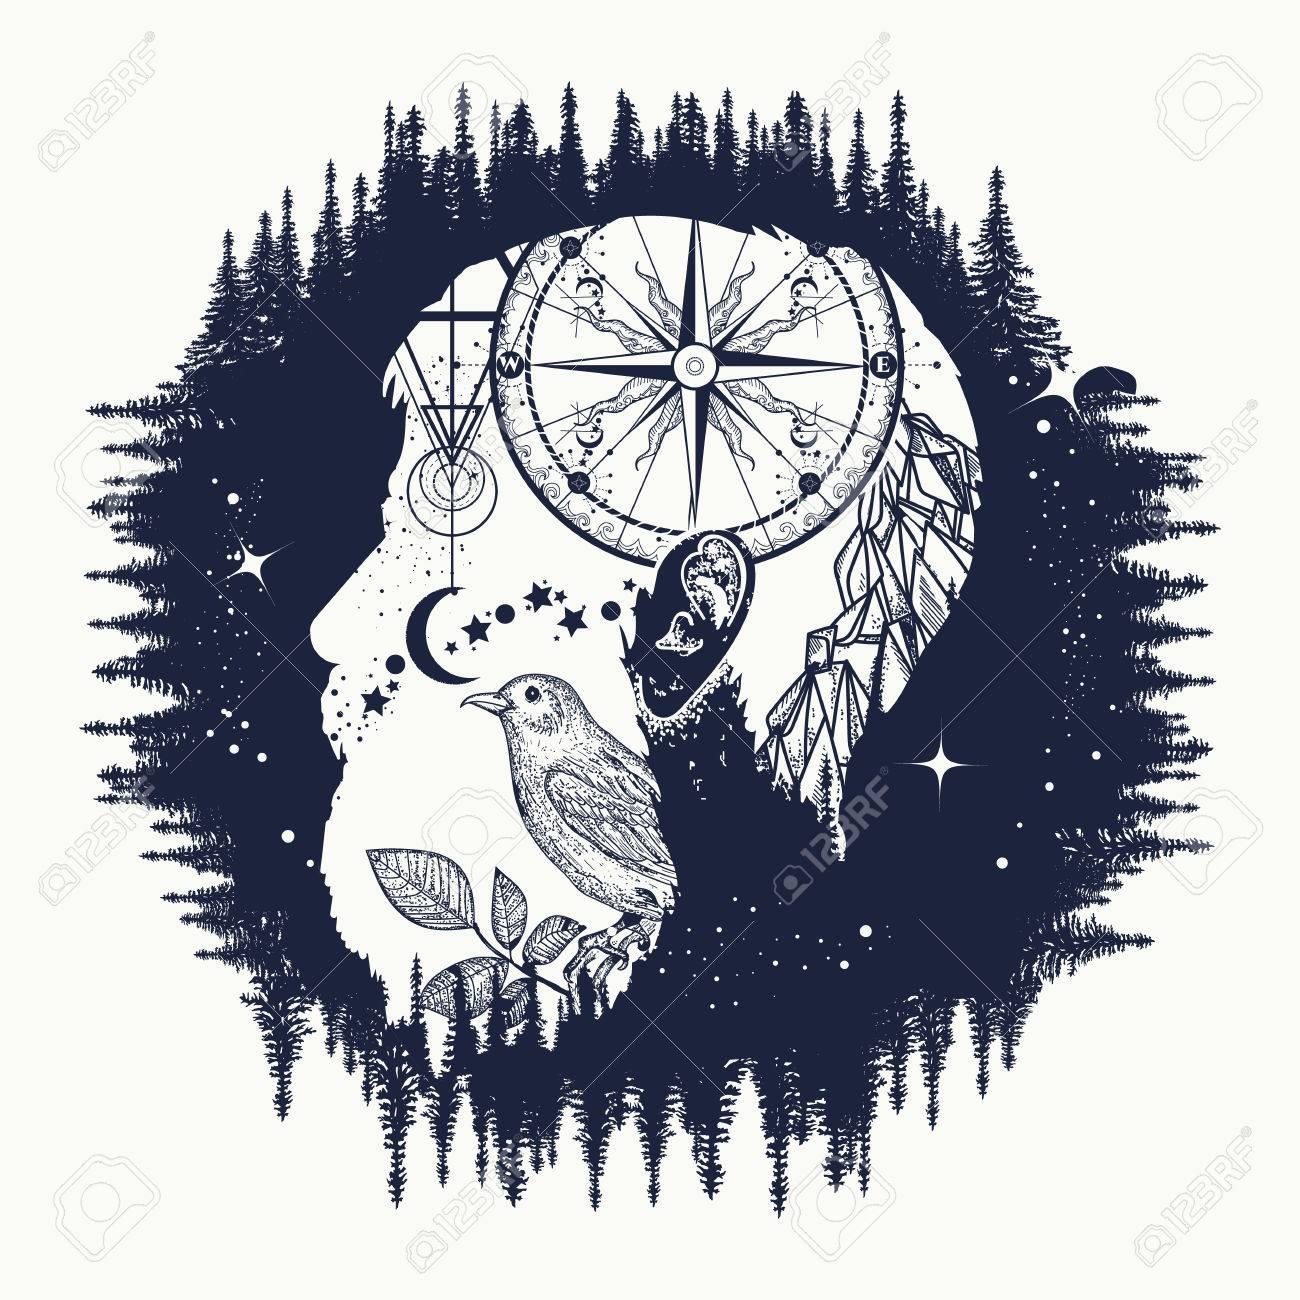 Hipster, double exposure tattoo art. Symbol travel, tourism, adventure. Portrait of hipster t-shirt design, compass, mountains, birds - 70188171